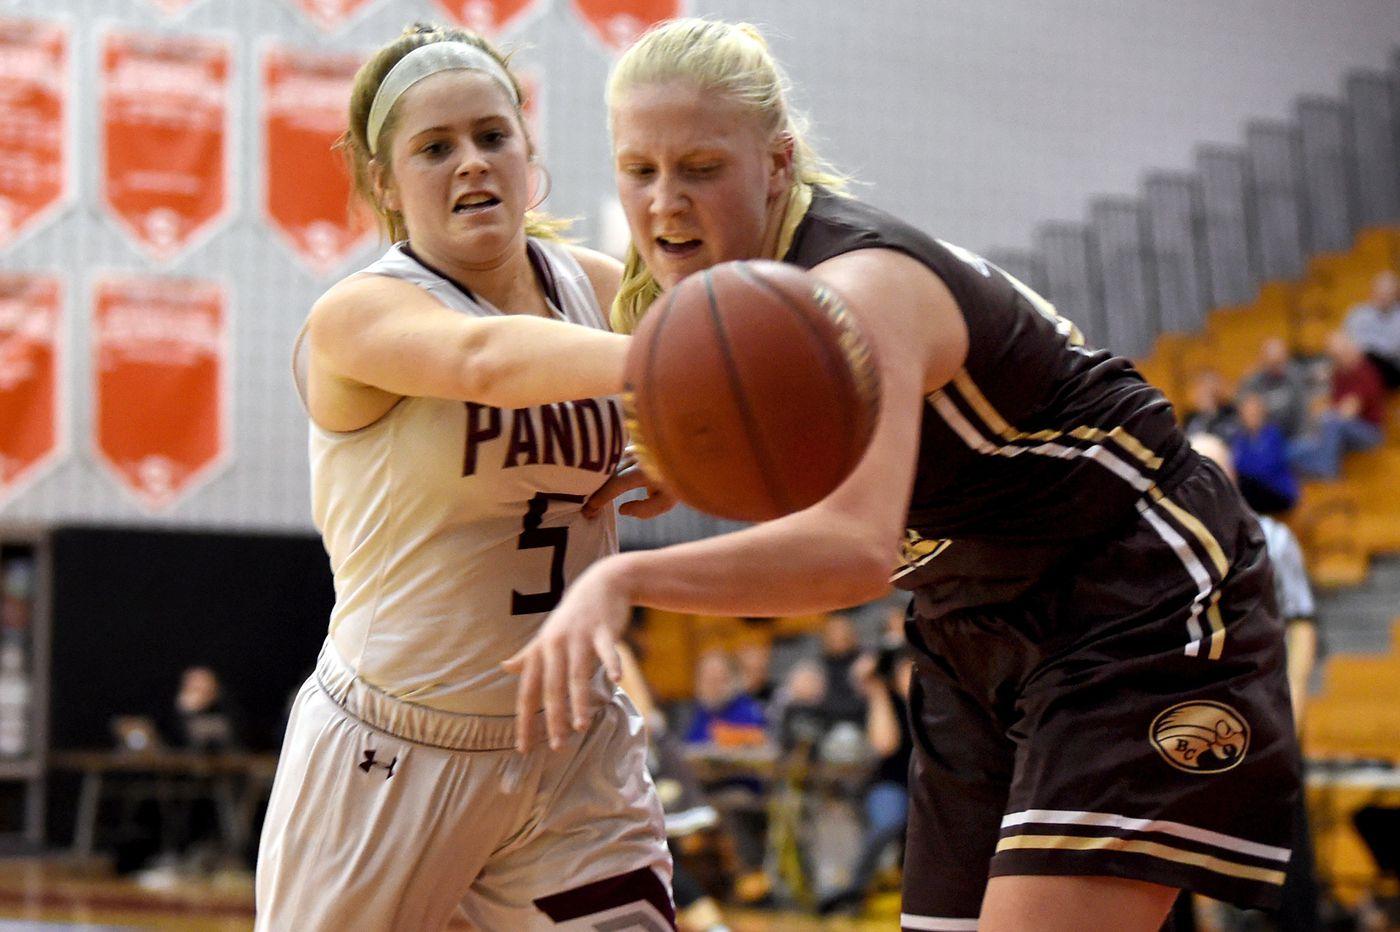 Monday's Southeastern Pa. roundup: Bridie McCann, Reagan Dolan power Bonner-Prendergast girls' basketball past Hallahan